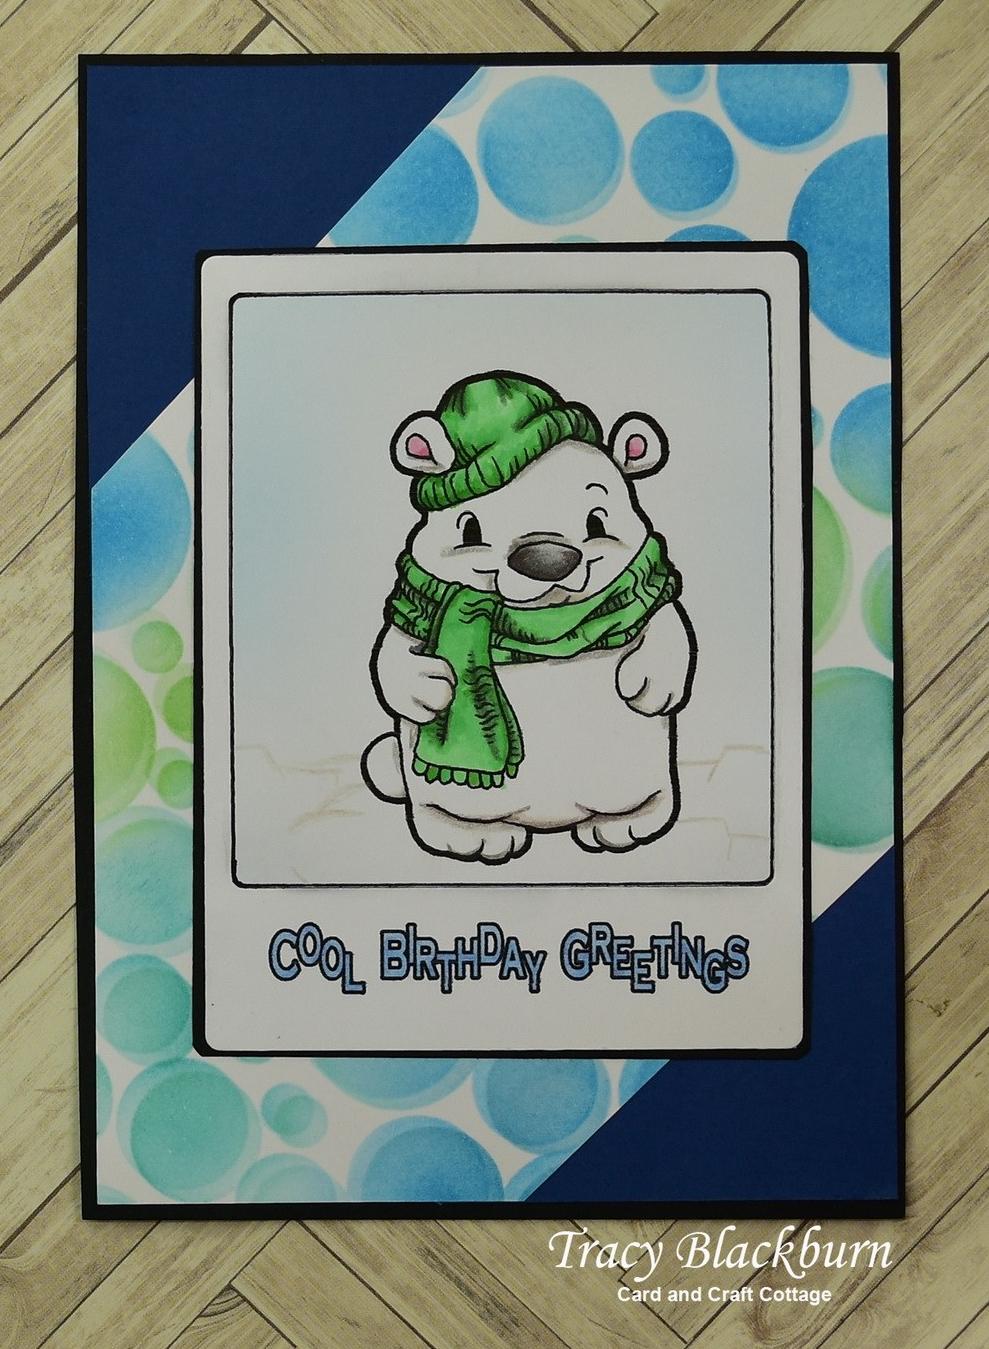 08 29 Polar Greetings